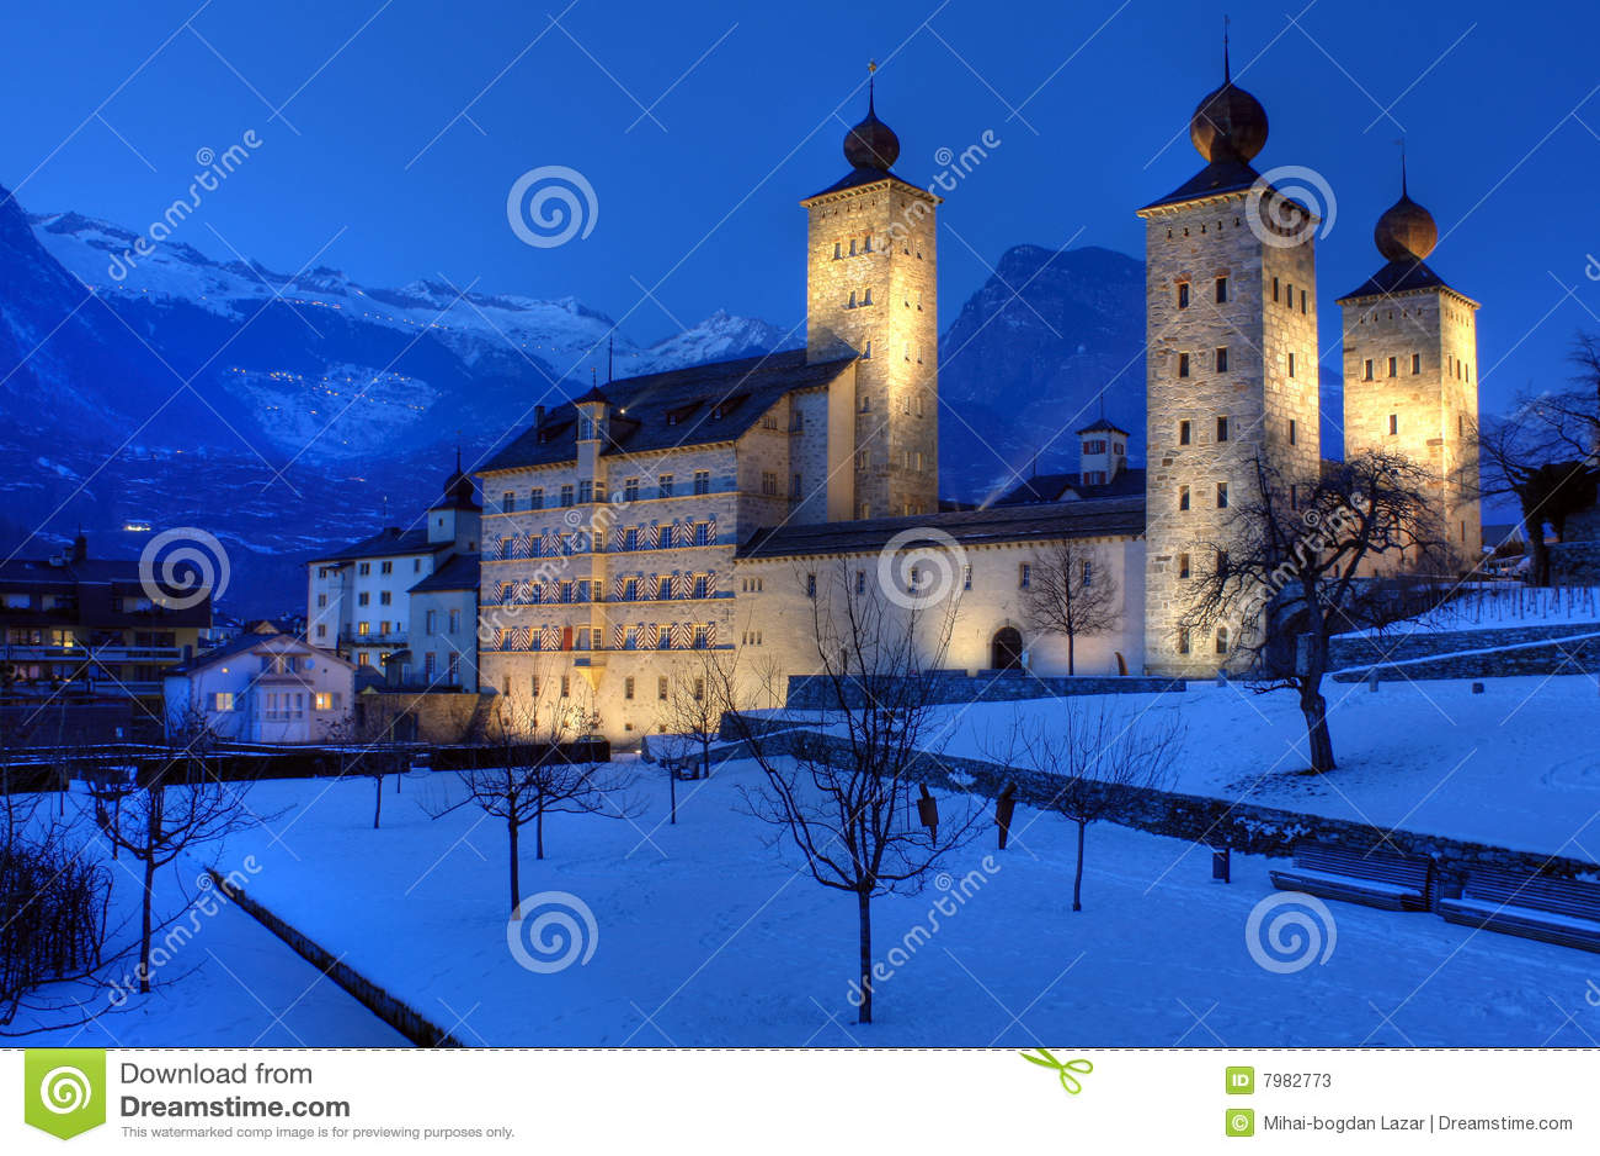 Palazzo 01, brigantino, Svizzera di Stockalper